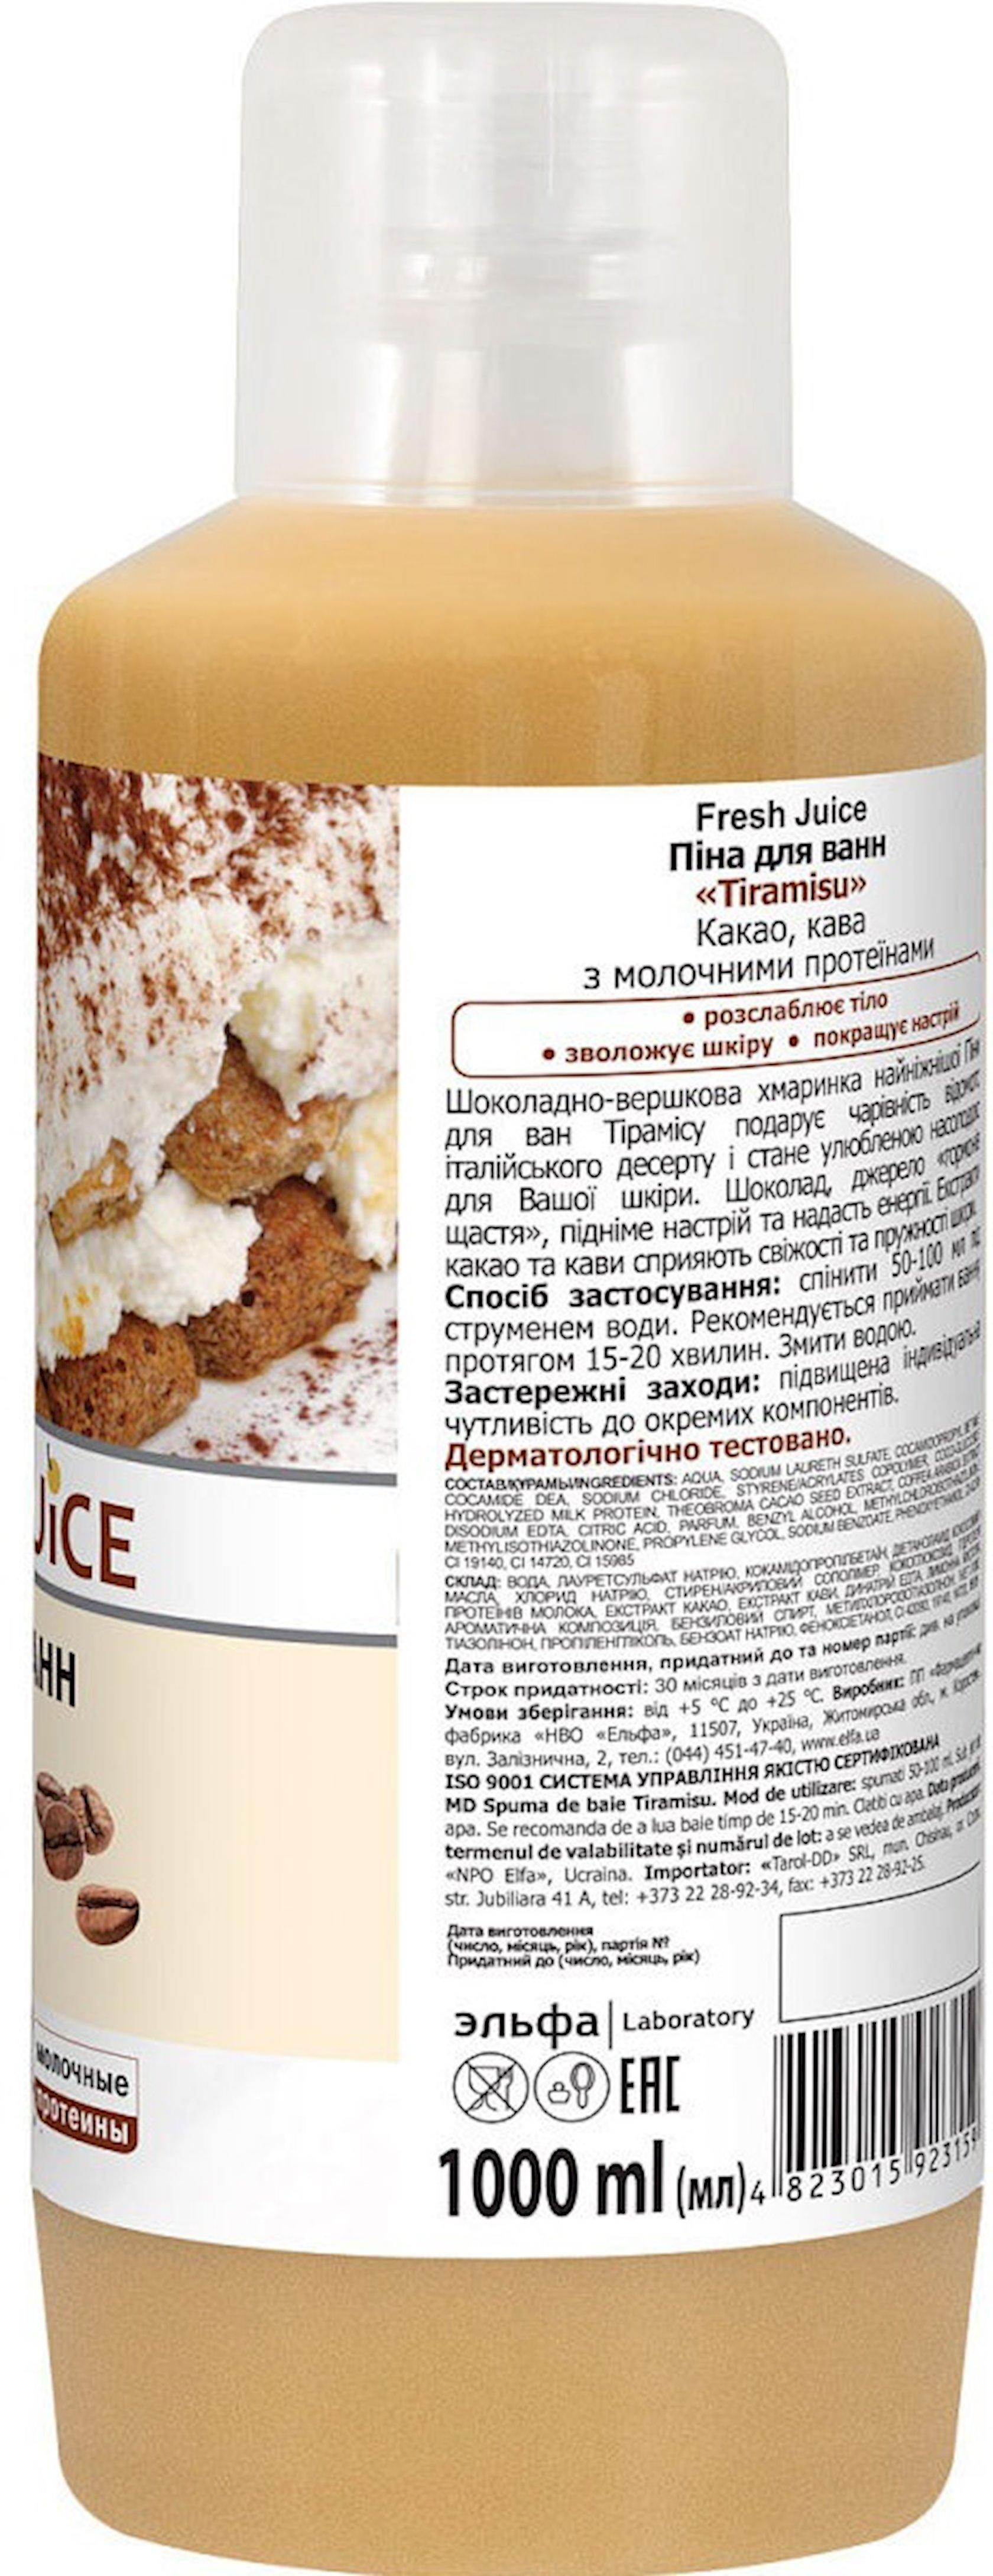 Vanna köpüyü Fresh Juice Tiramisu, 1000 ml